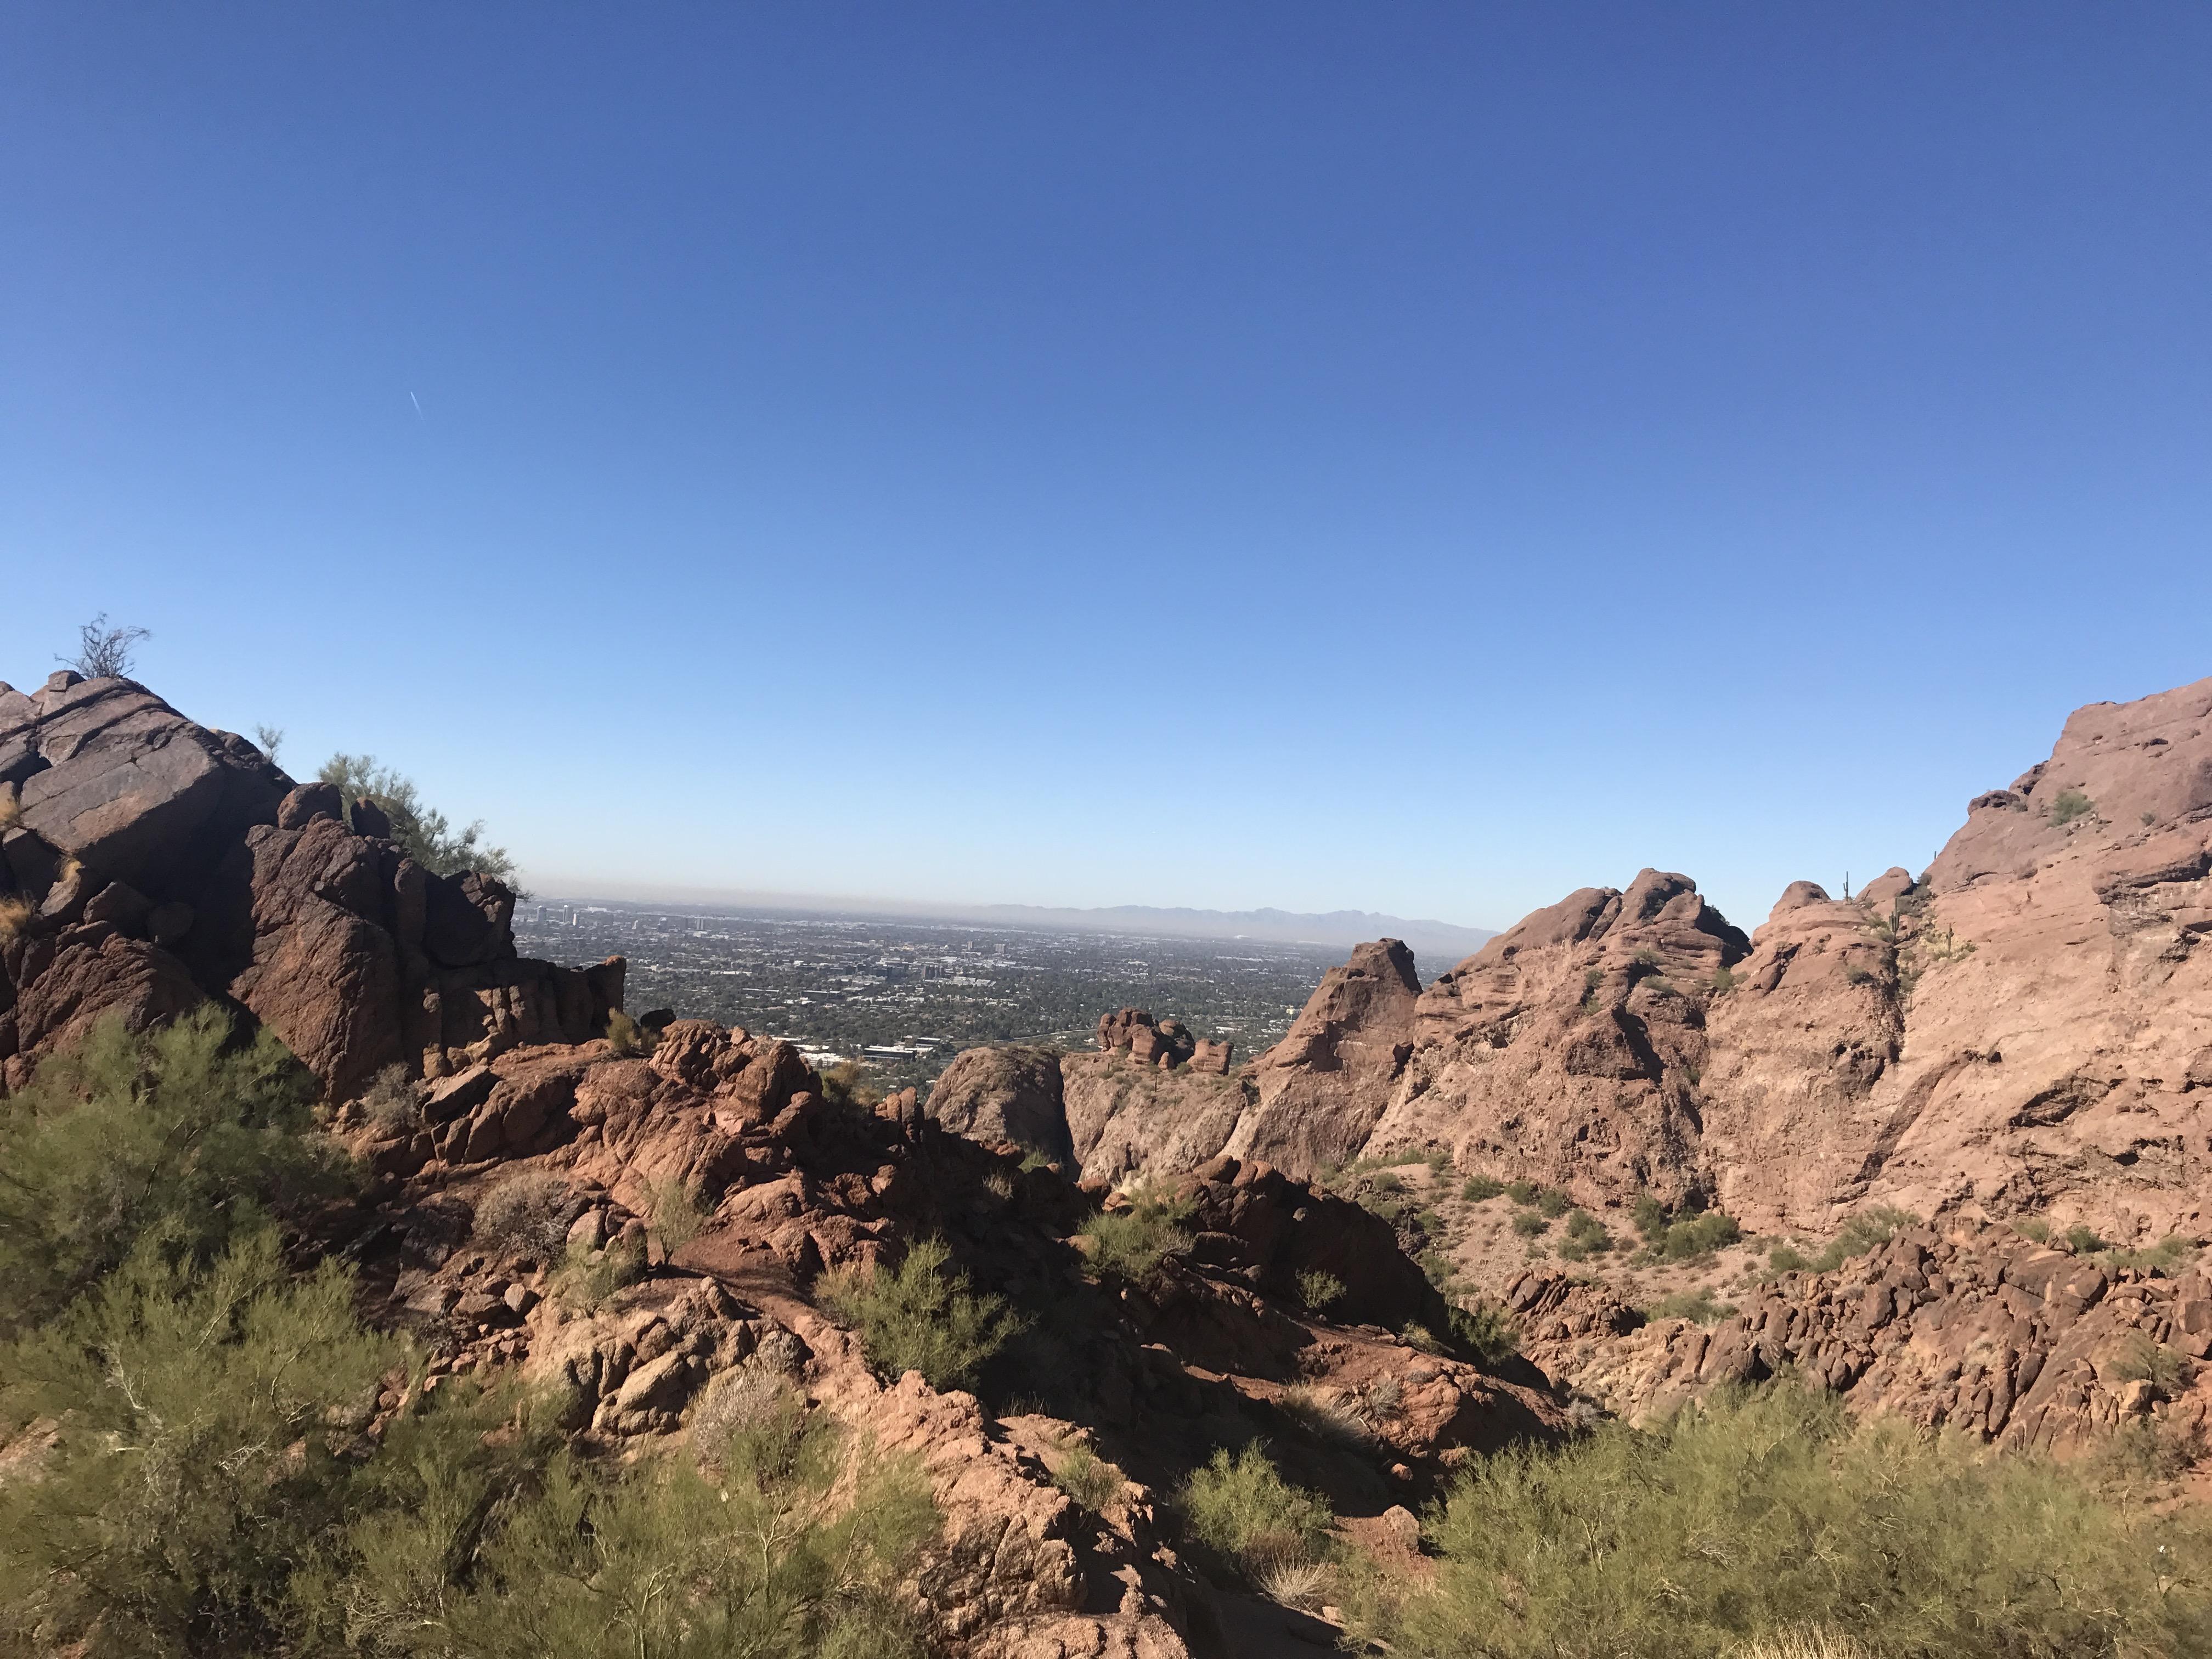 Camelback Echo Canyon Trail - A Long Weekend In Scottsdale, Arizona - Travel In Arizona - Arizona To Do - Communikait by Kait Hanson